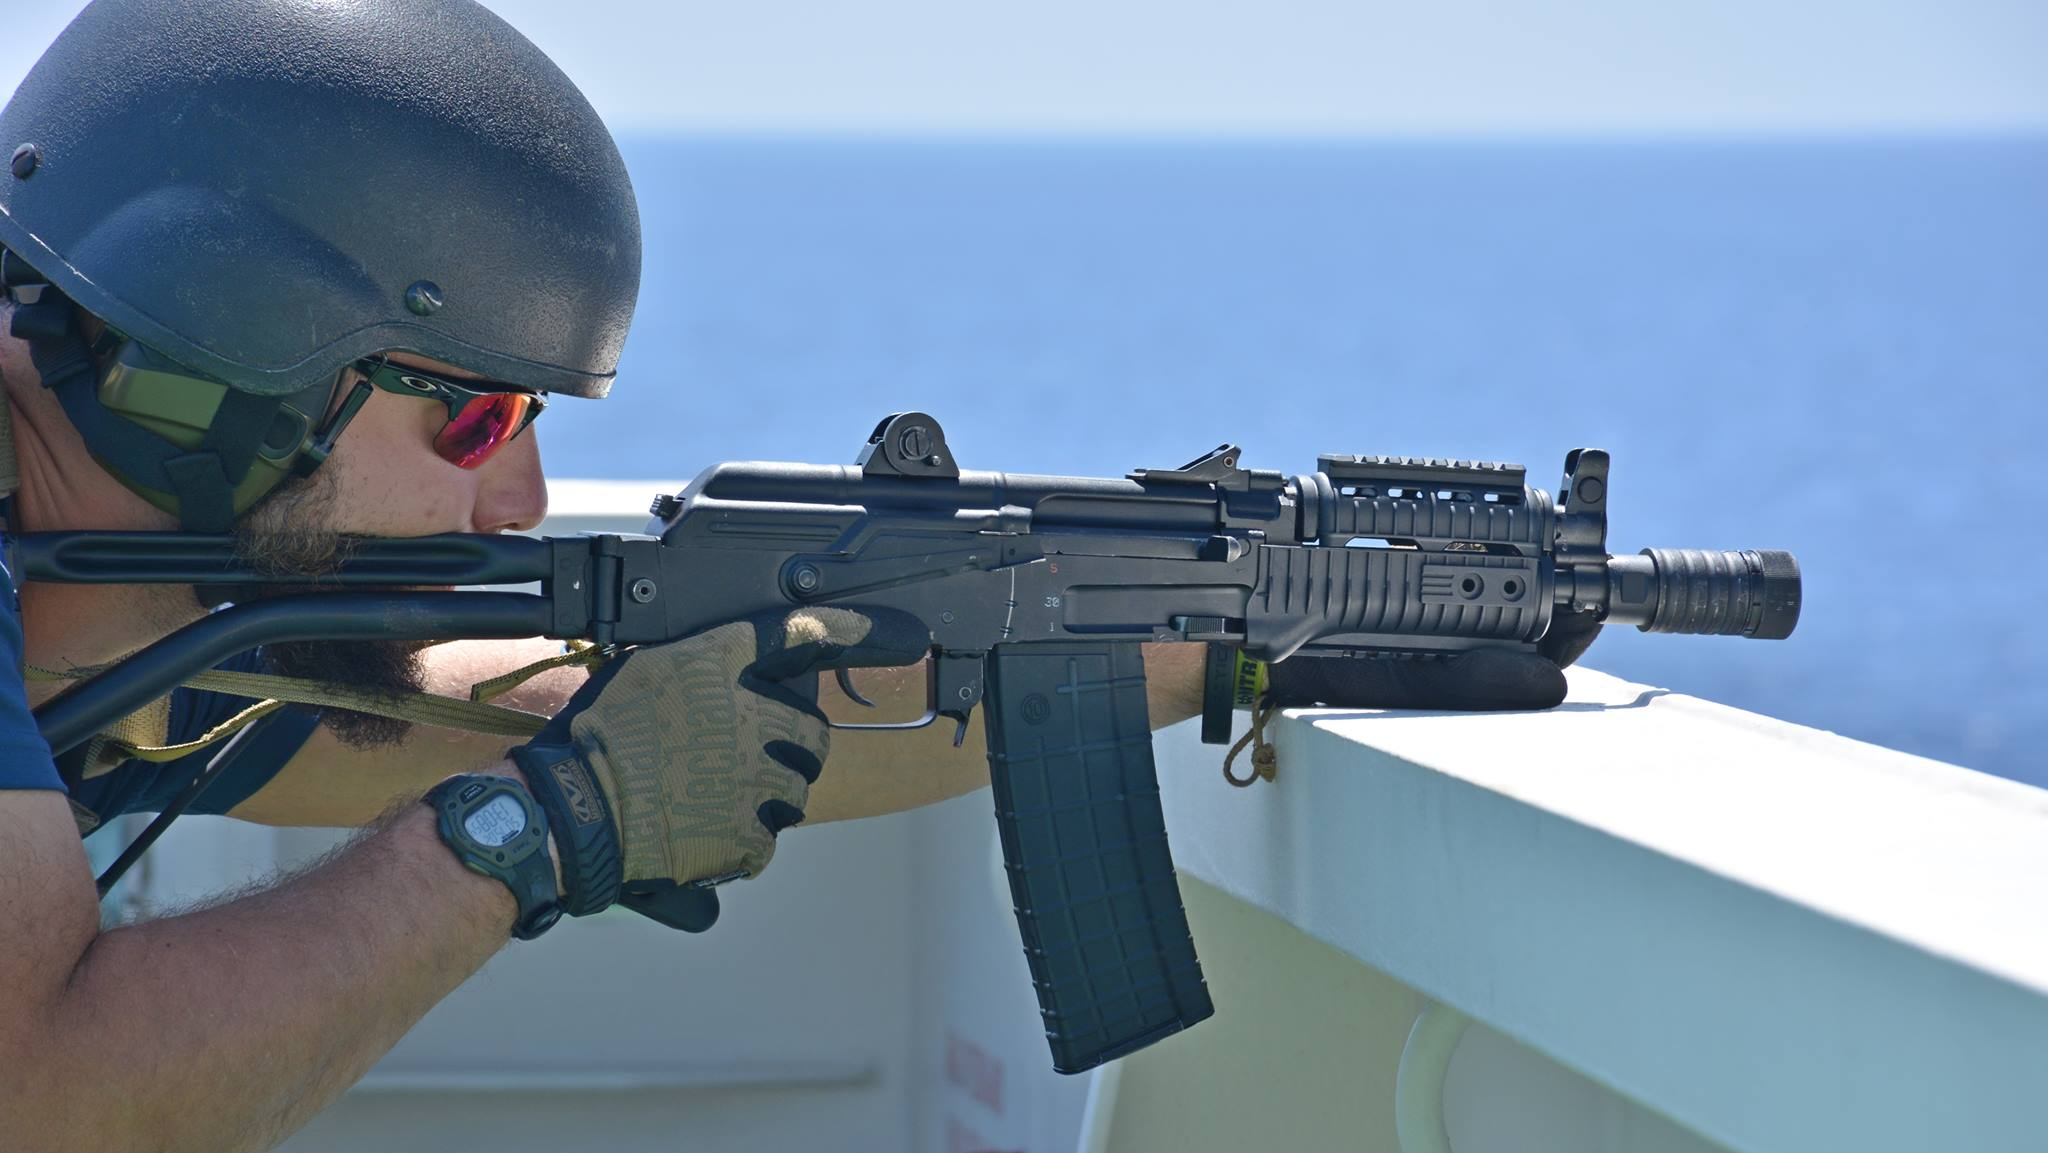 Szkolenie Karabin - Poziom 1- karabin